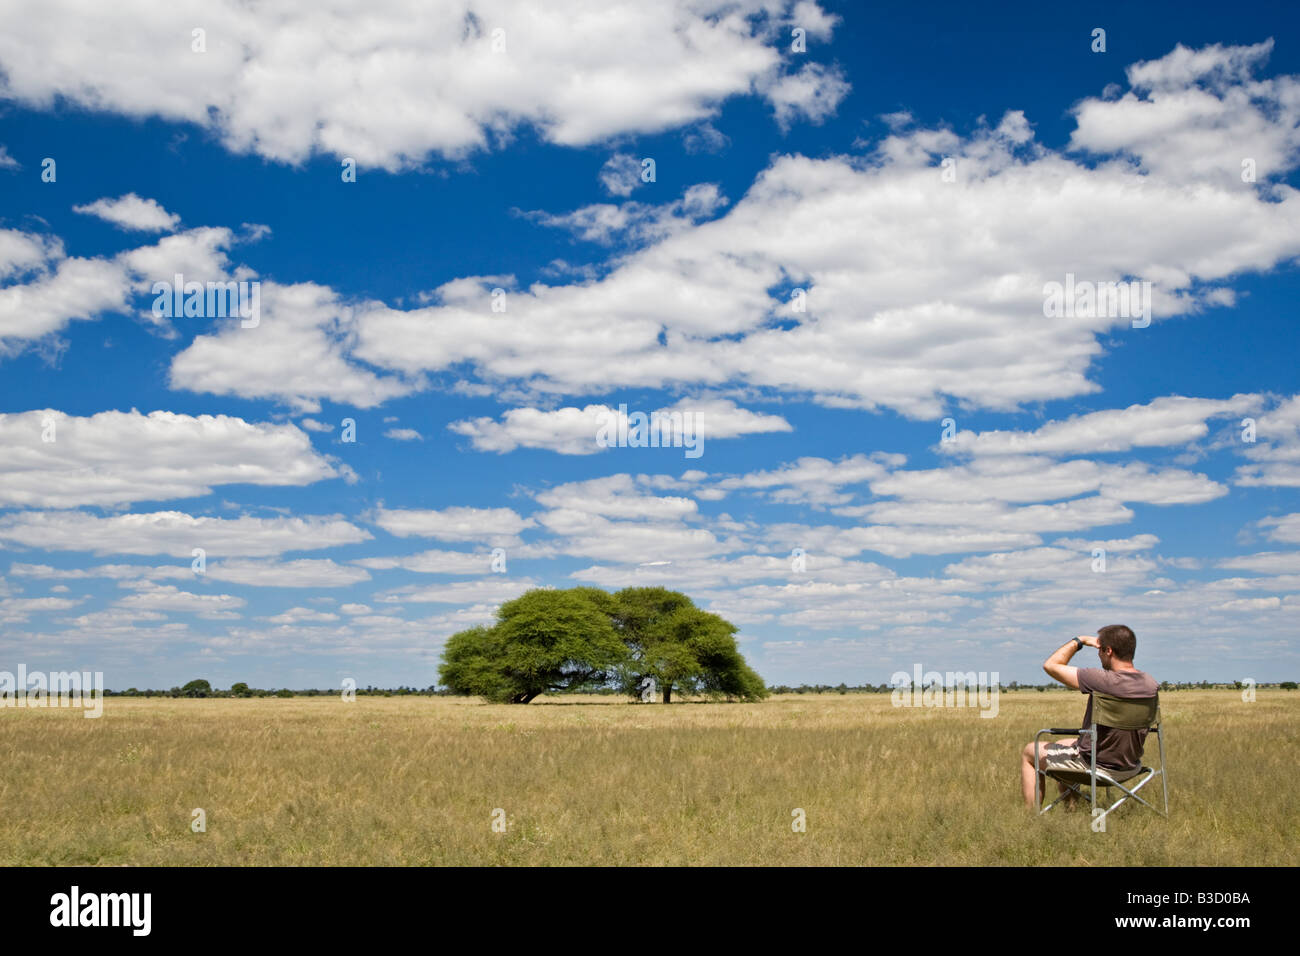 África, Botswana, turista mirando el paisaje Imagen De Stock